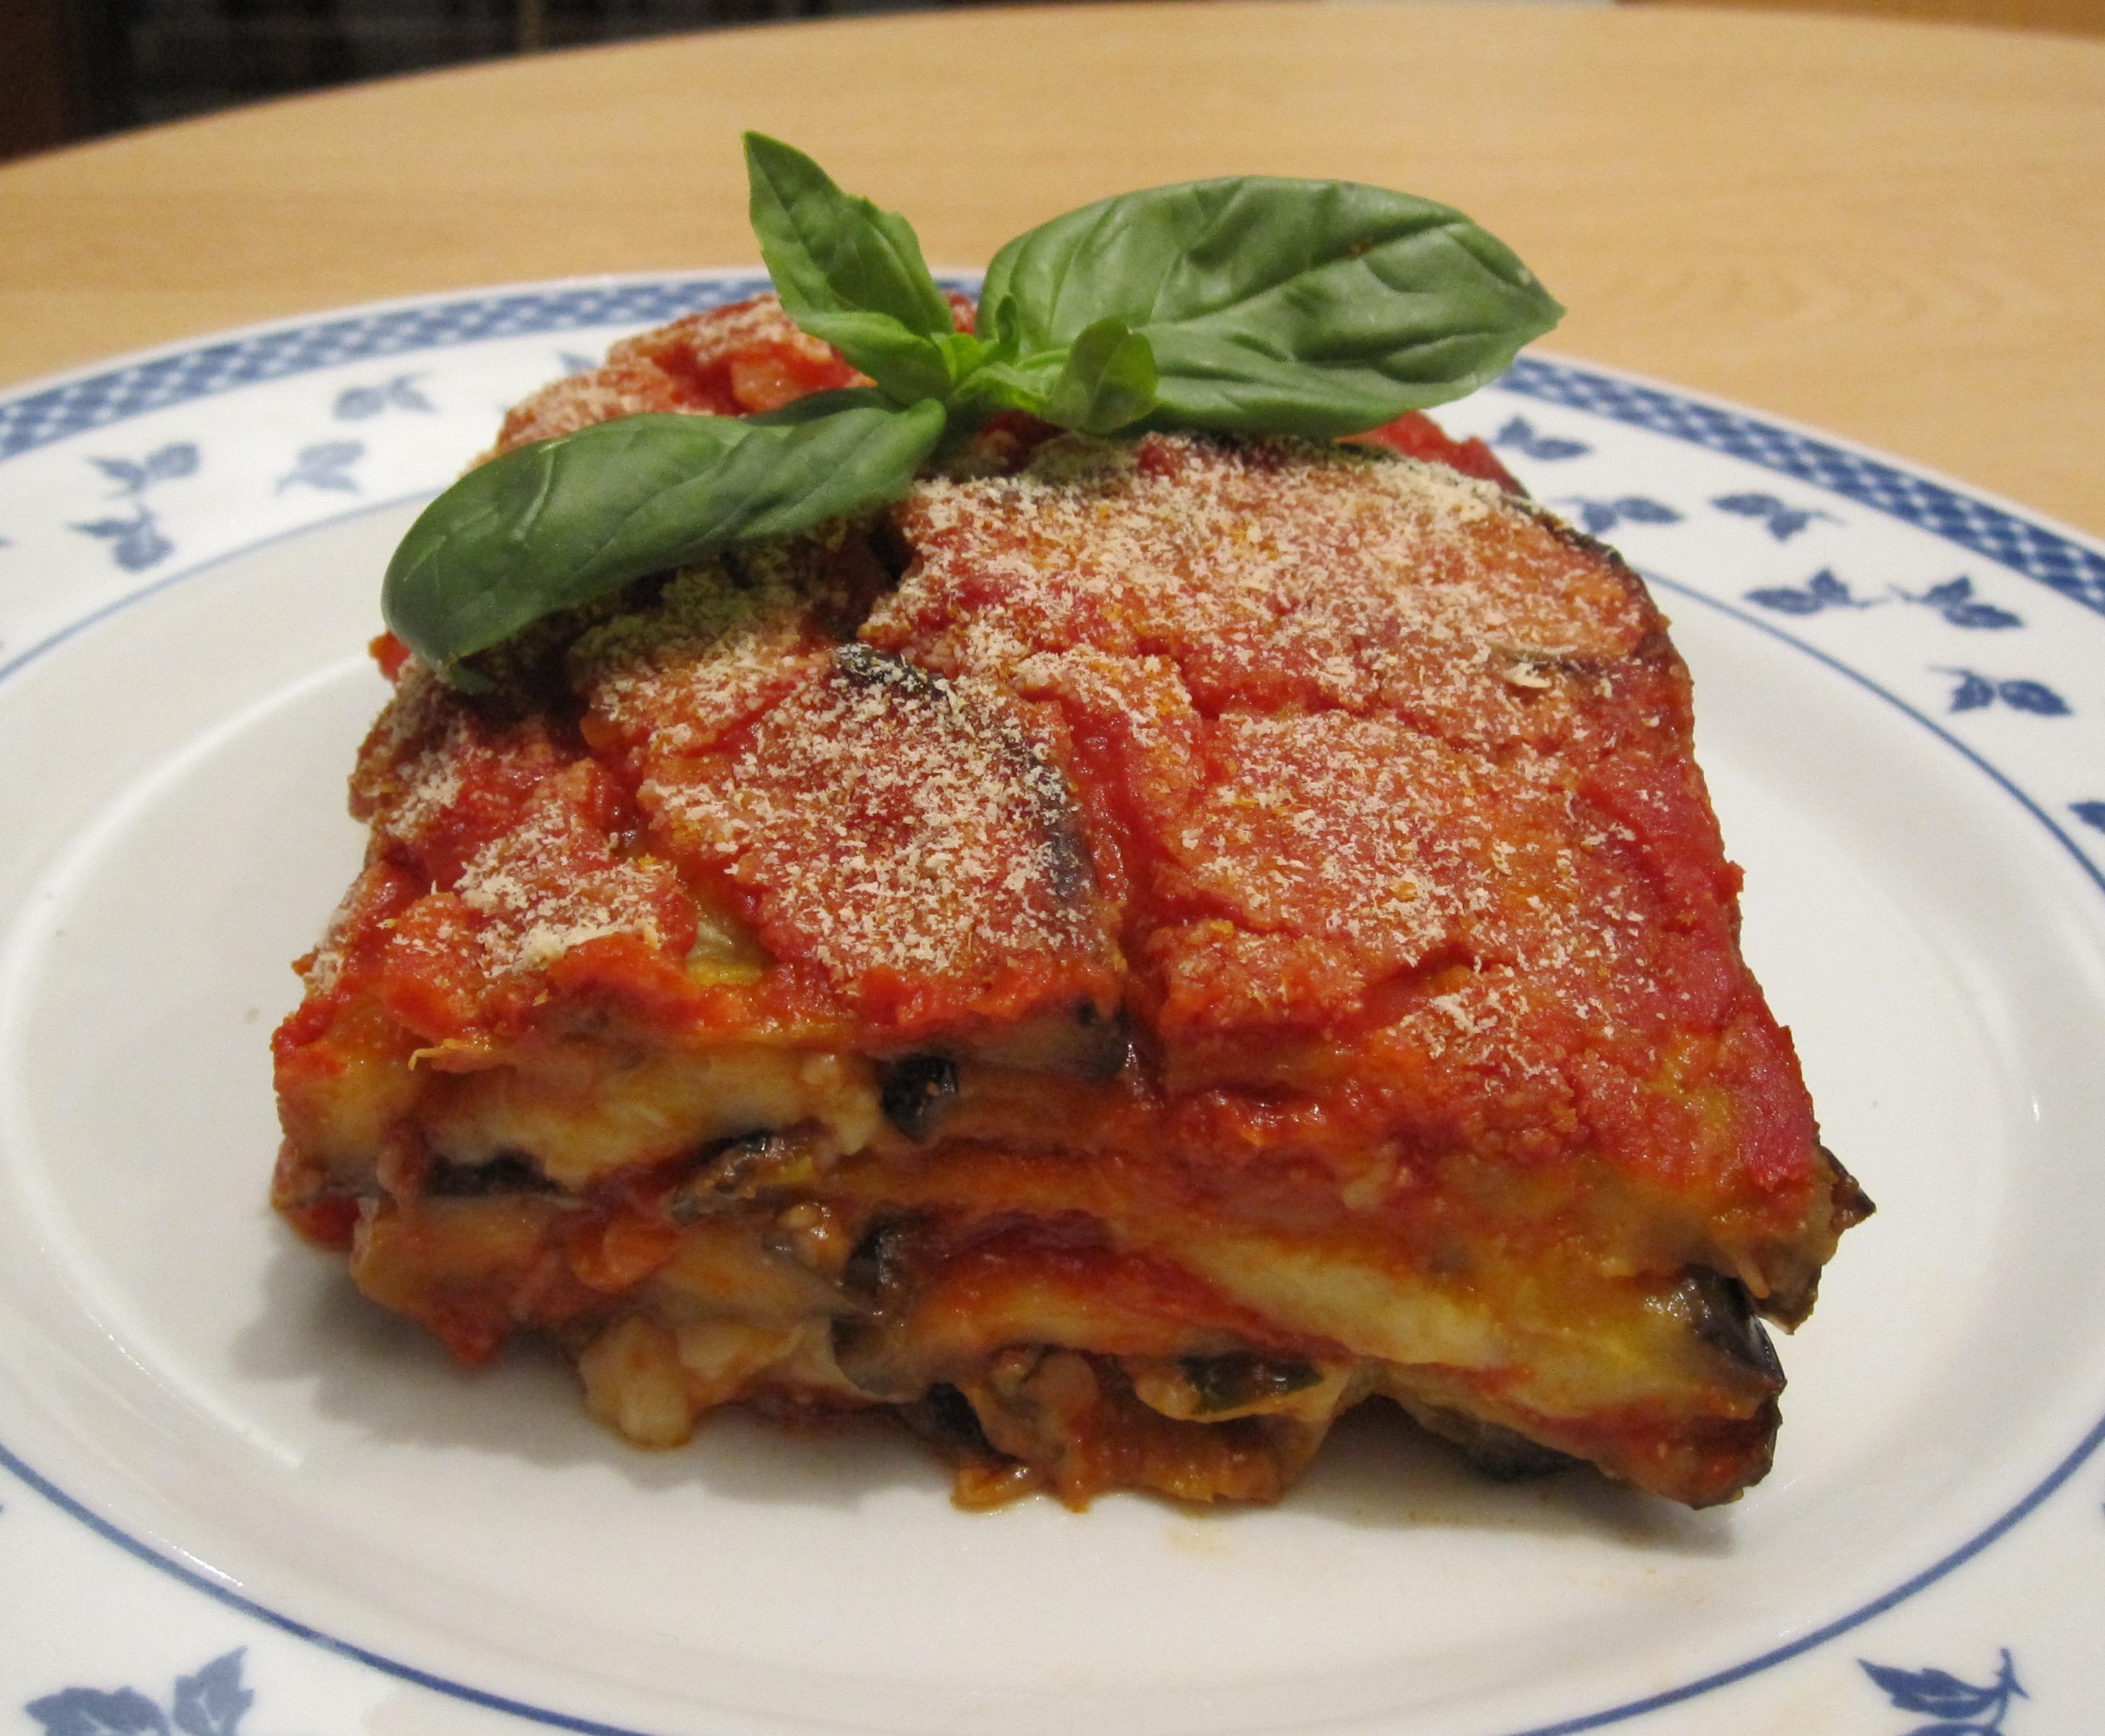 Cucina siciliana la mia cucina vegetalela mia cucina for Cucina siciliana